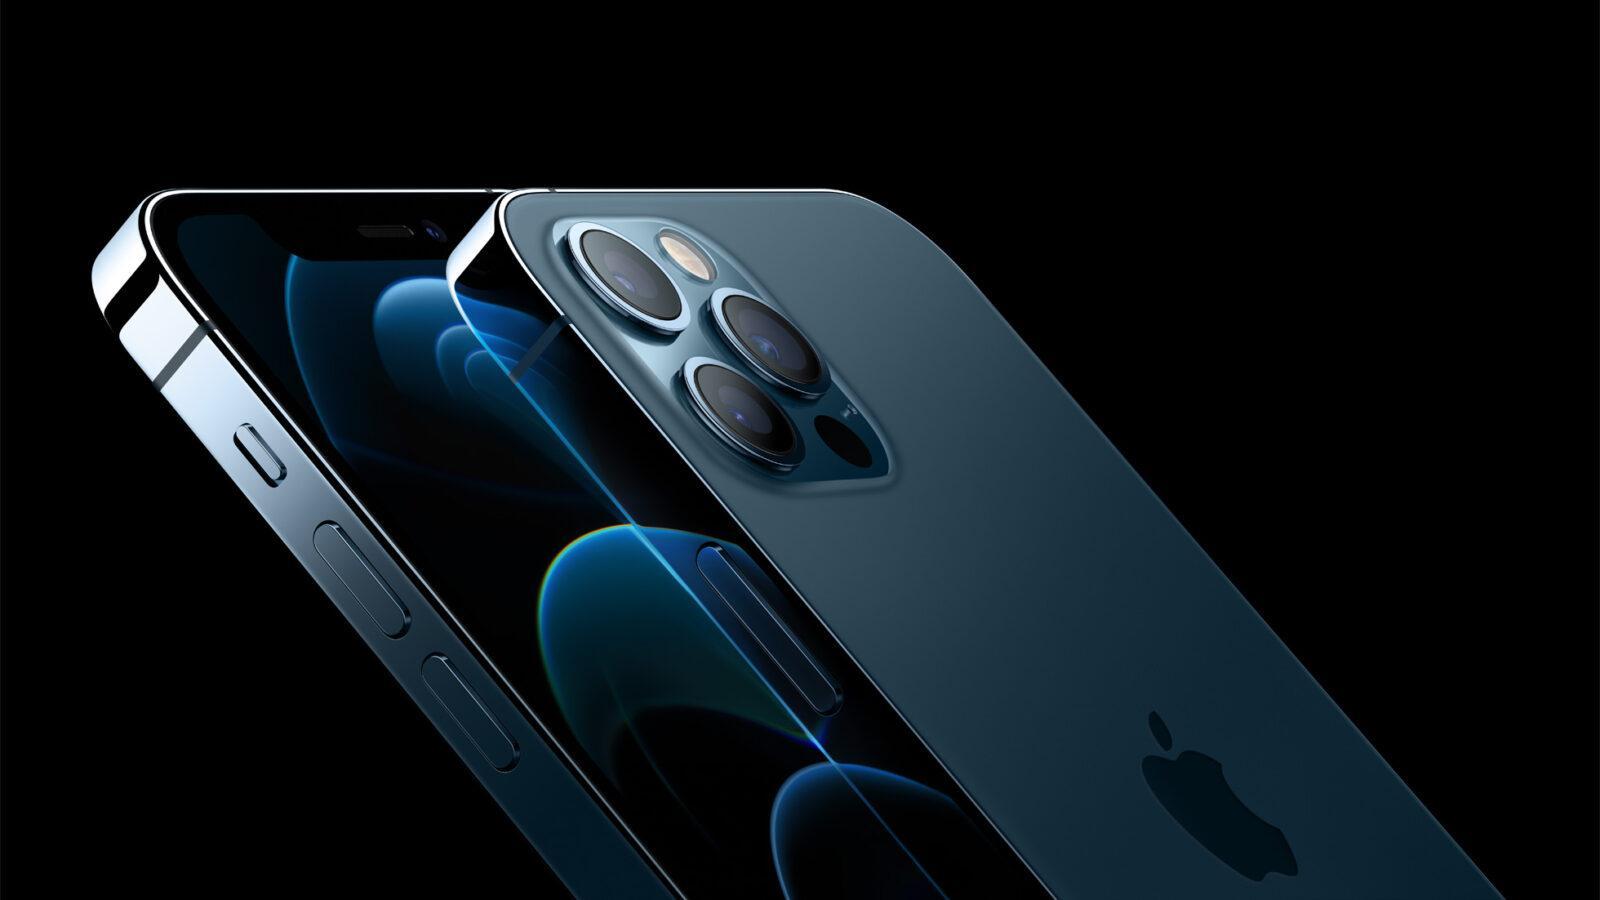 В России начались продажи iPhone 12 Pro Max и iPhone 12 mini (apple announce iphone12pro 10132020)